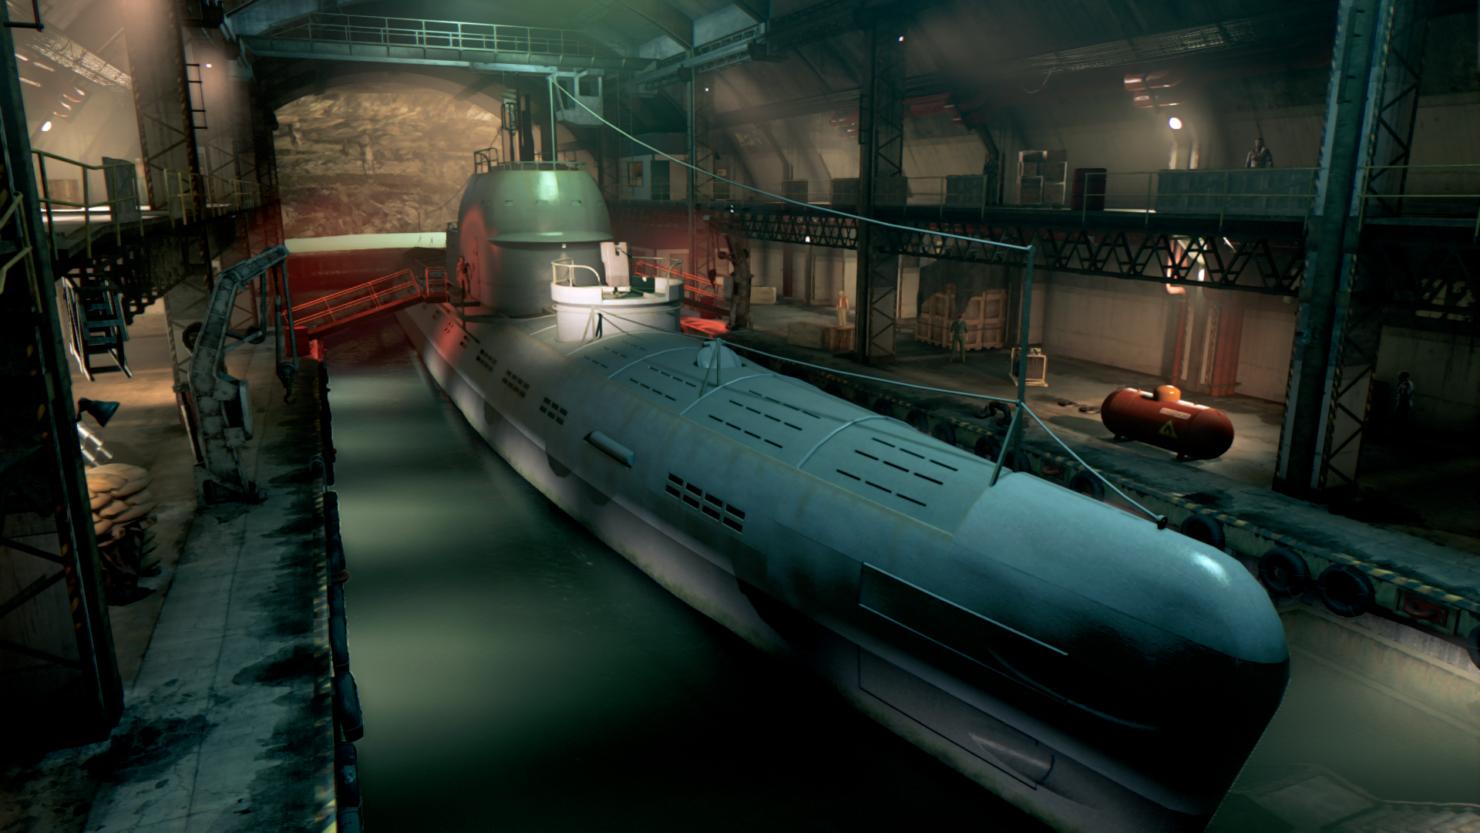 mafia3_dlc2_stones_unturned_screenshot_12_environment_island_hideout_sub_hangar